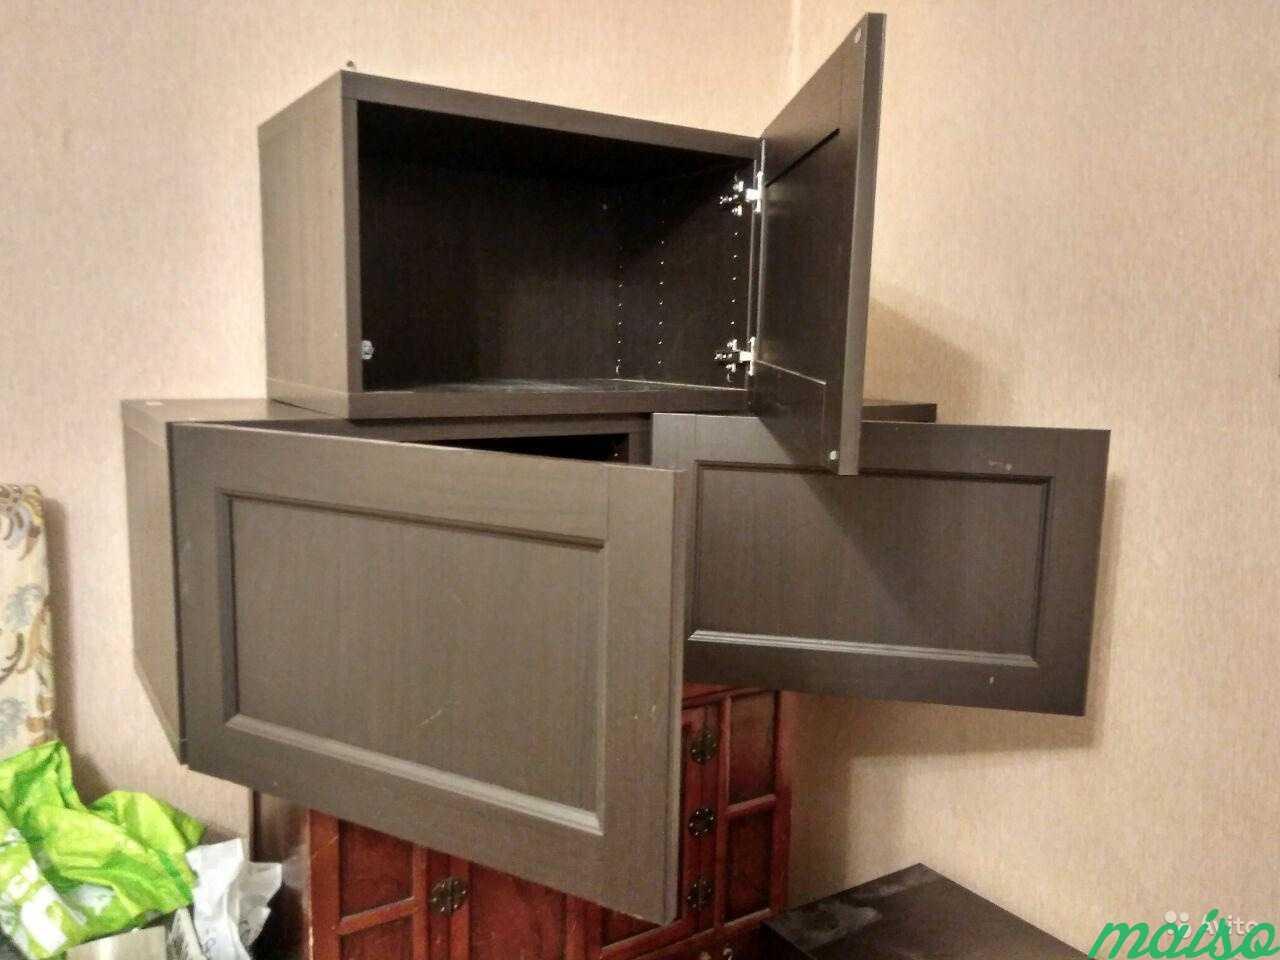 Система шкафов IKEA besta в Москве. Фото 2